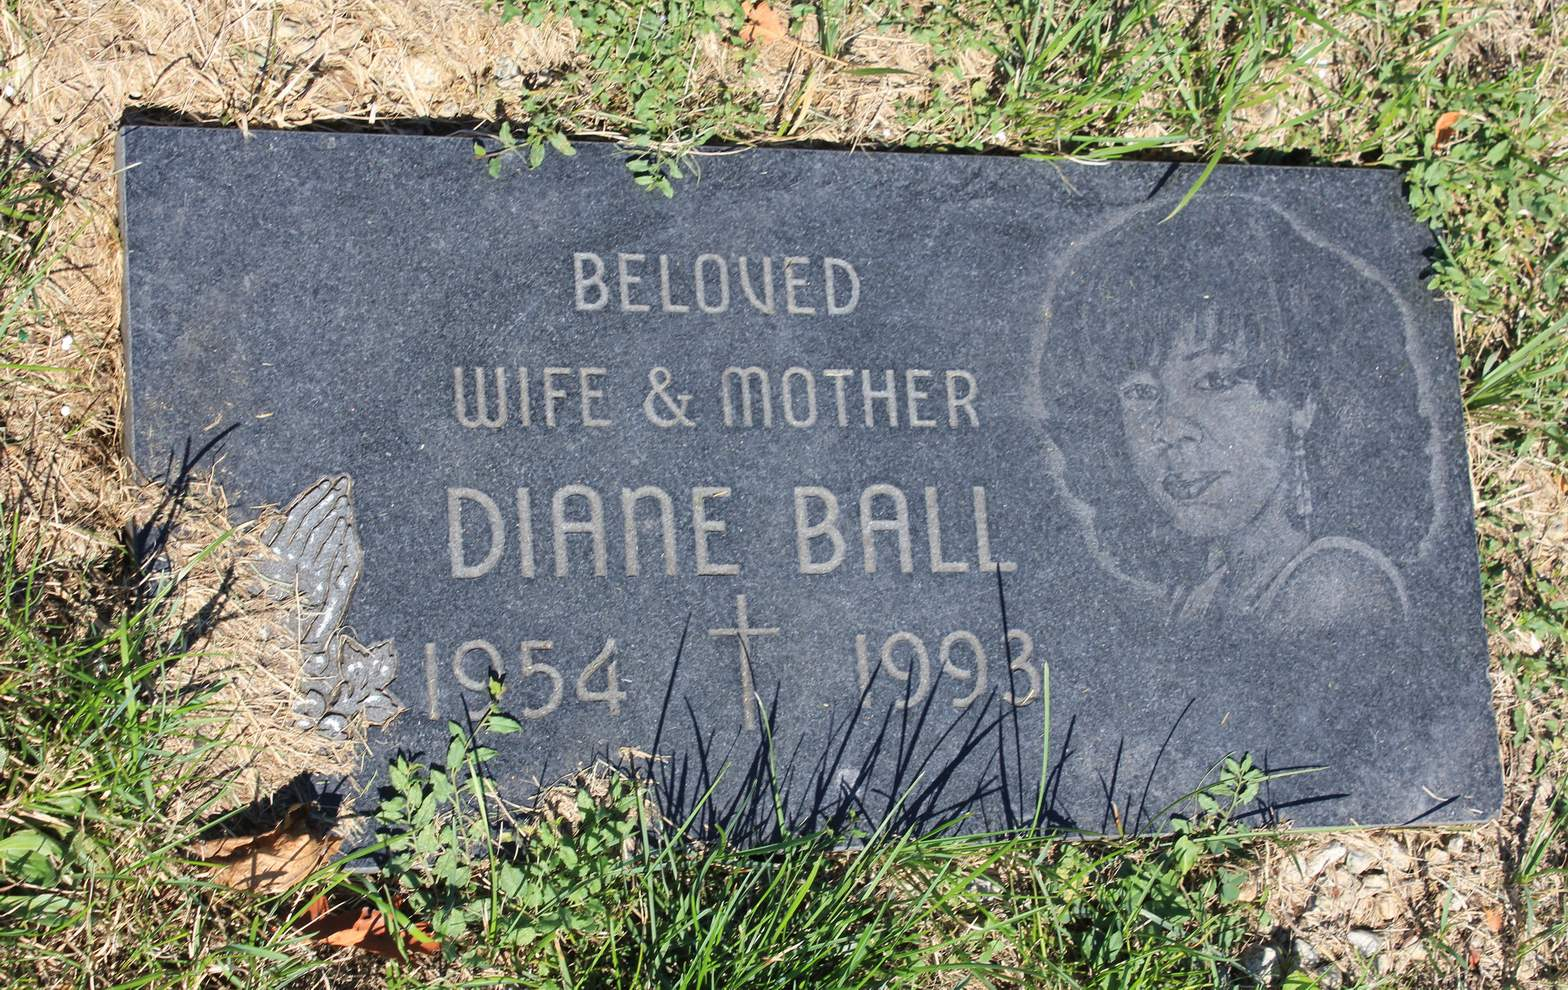 Diane Ball